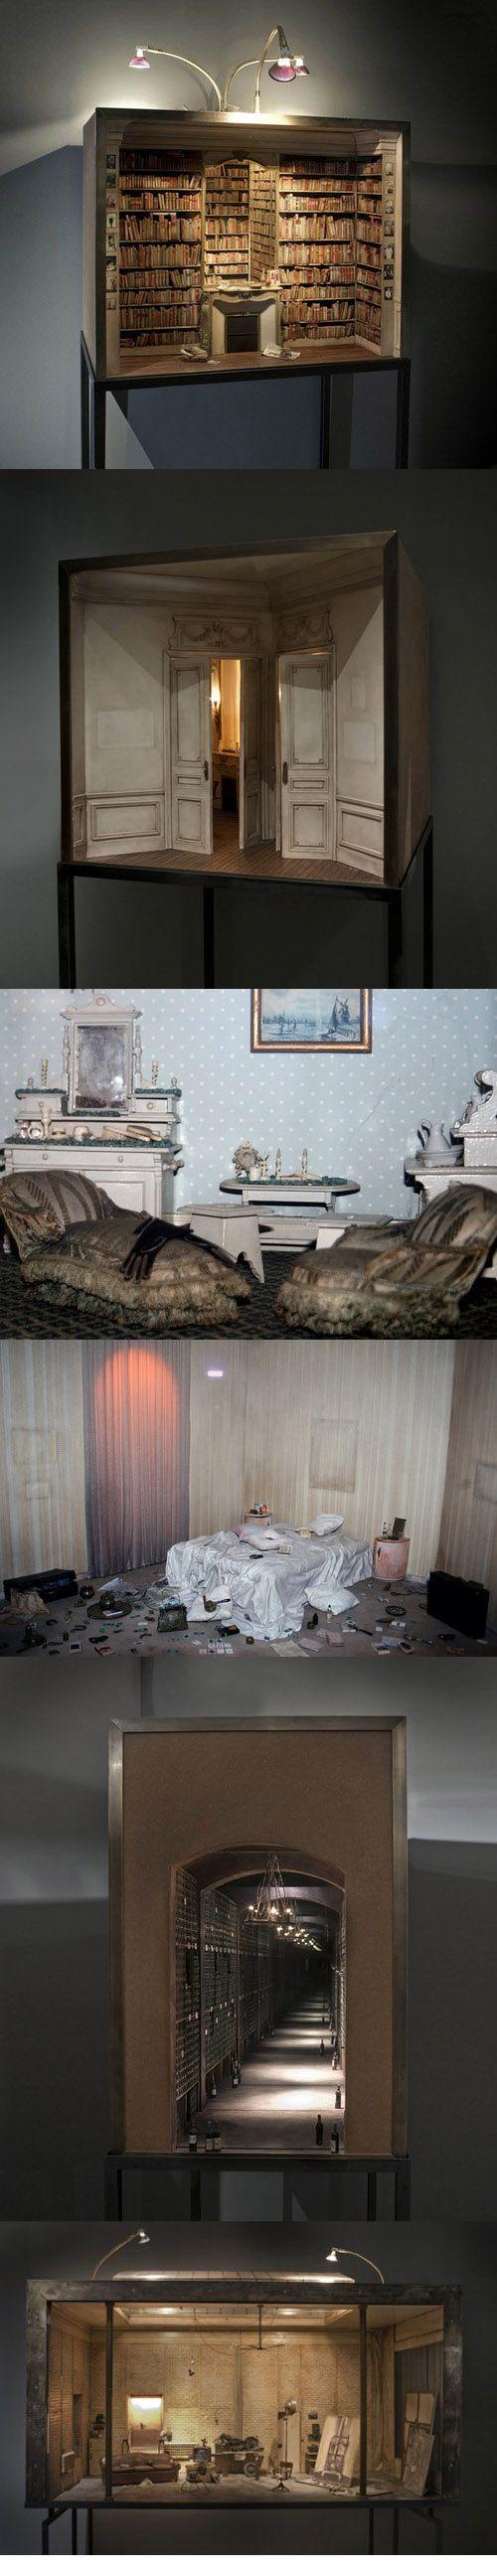 Enclosures :: Handmade miniature interiors  ( by Charles Matton ) I love the little wine cellar :)